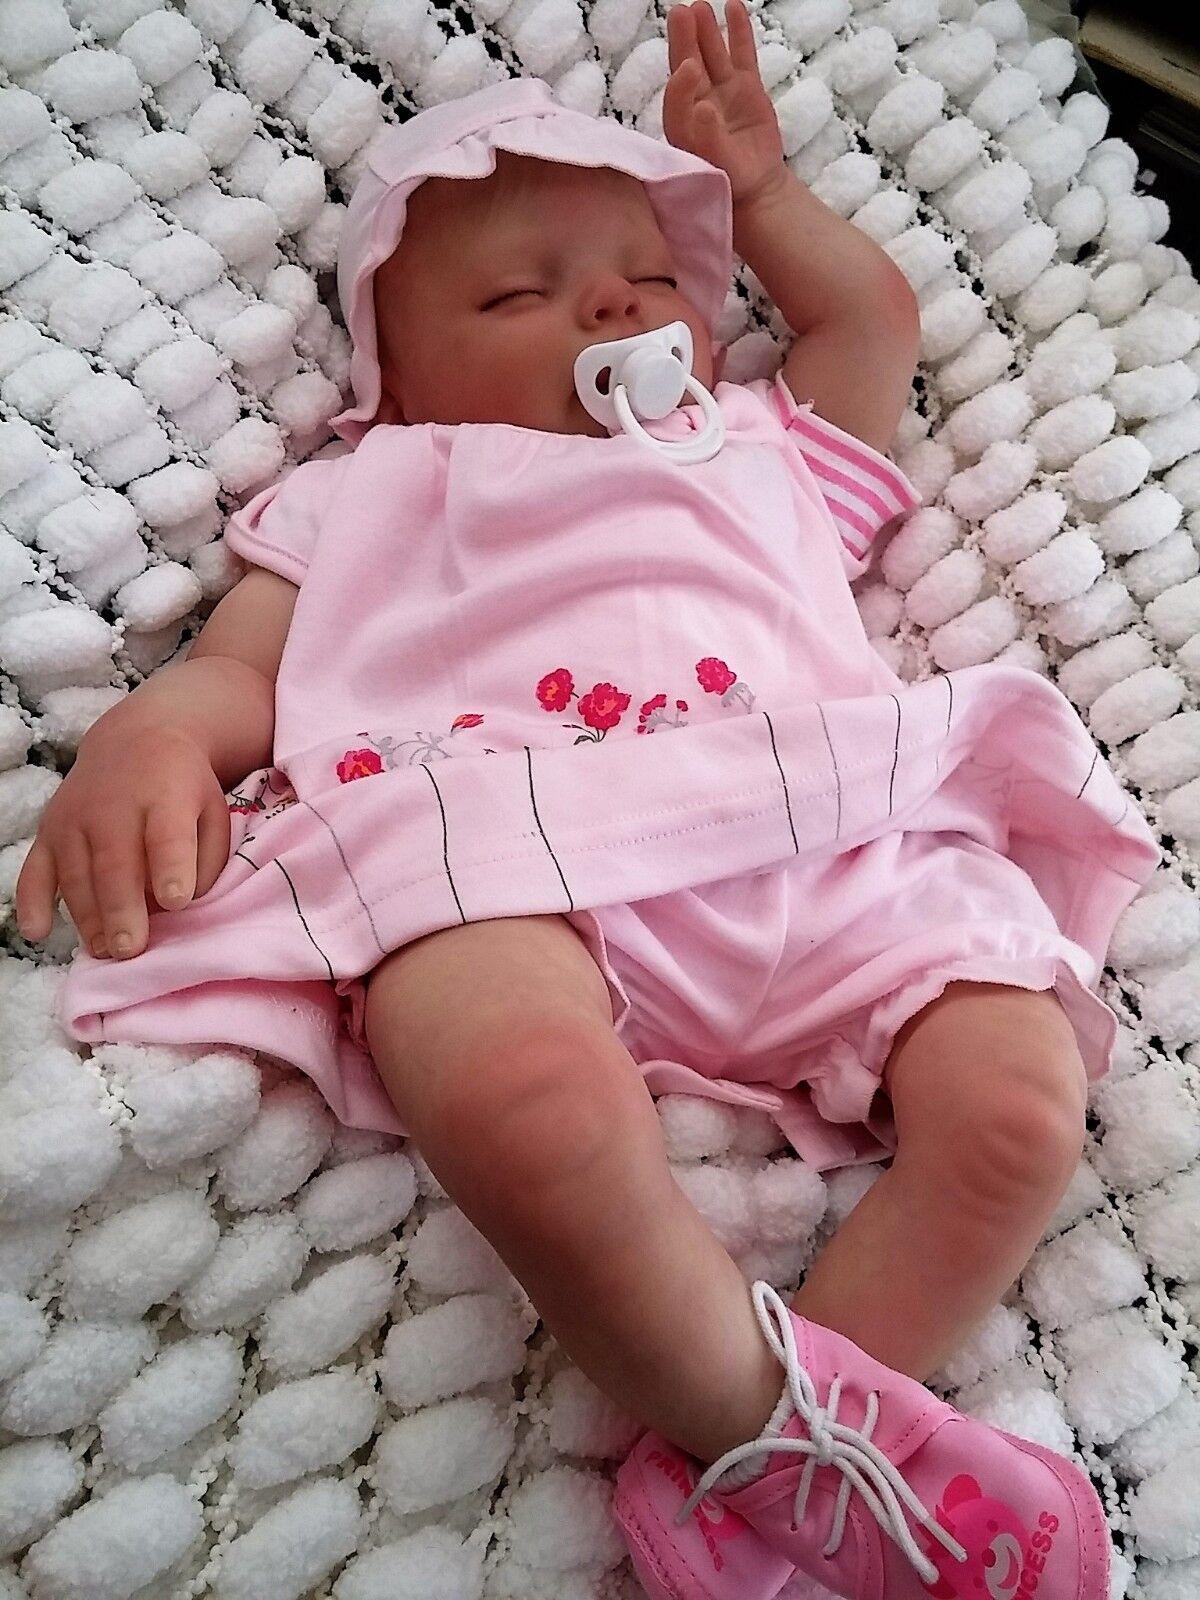 Muñeca Reborn Baby Toddler 7LBS Y Bolsa De Regalo, artista 9YR mujer Rubert sunbeambabies